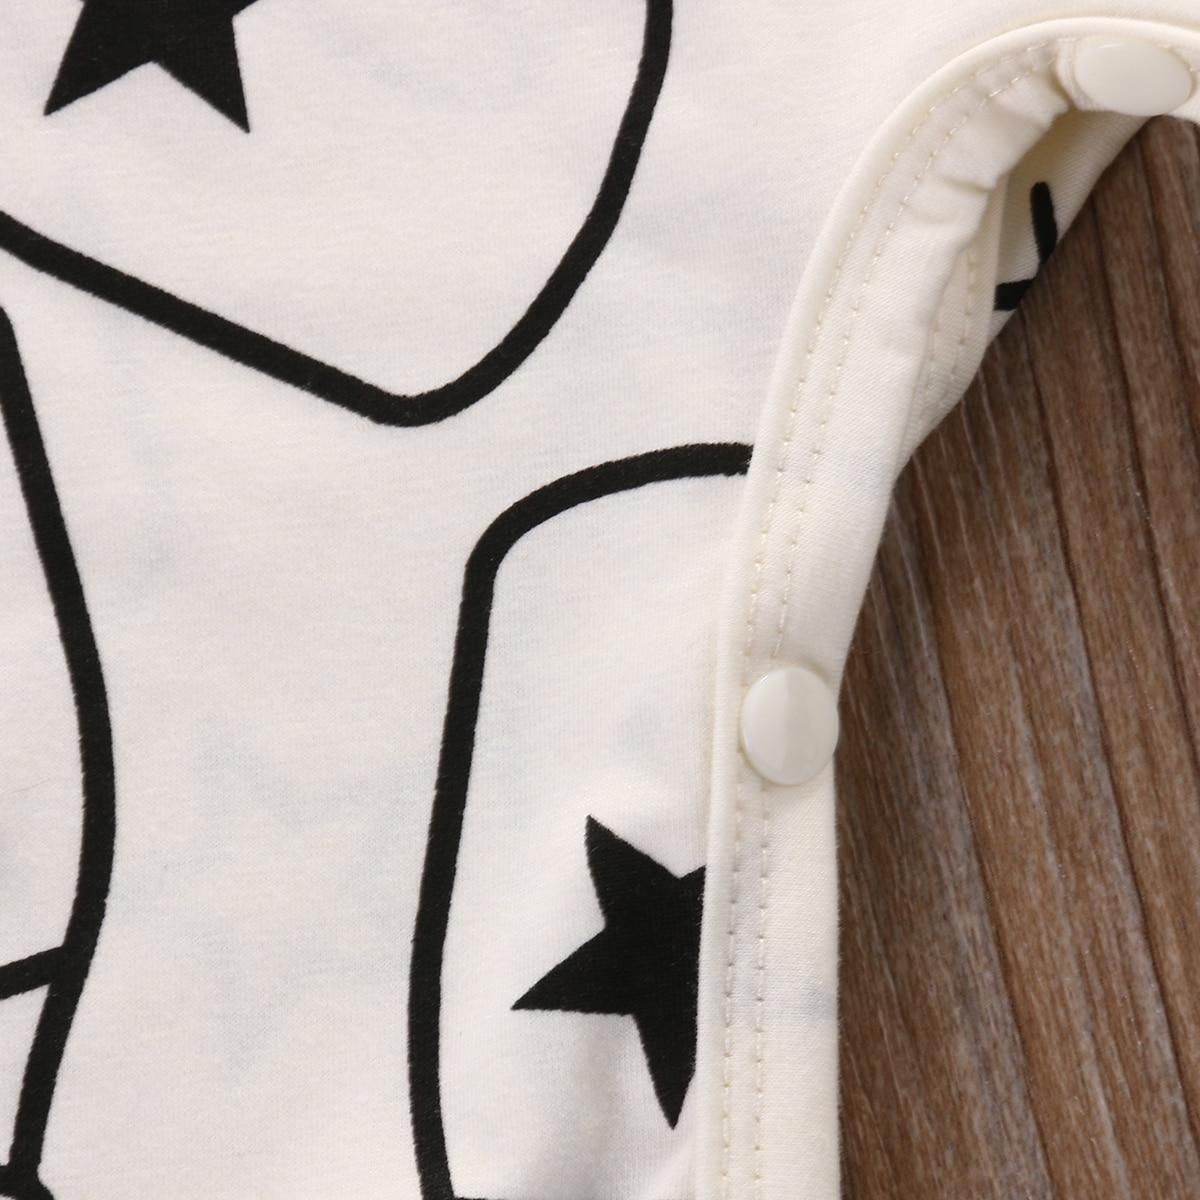 Top-Baby-Kids-Boy-Girl-Infant-Long-Sleeve-Romper-Milk-bottle-Jumpsuit-Cotton-Clothes-Outfit-Set-3